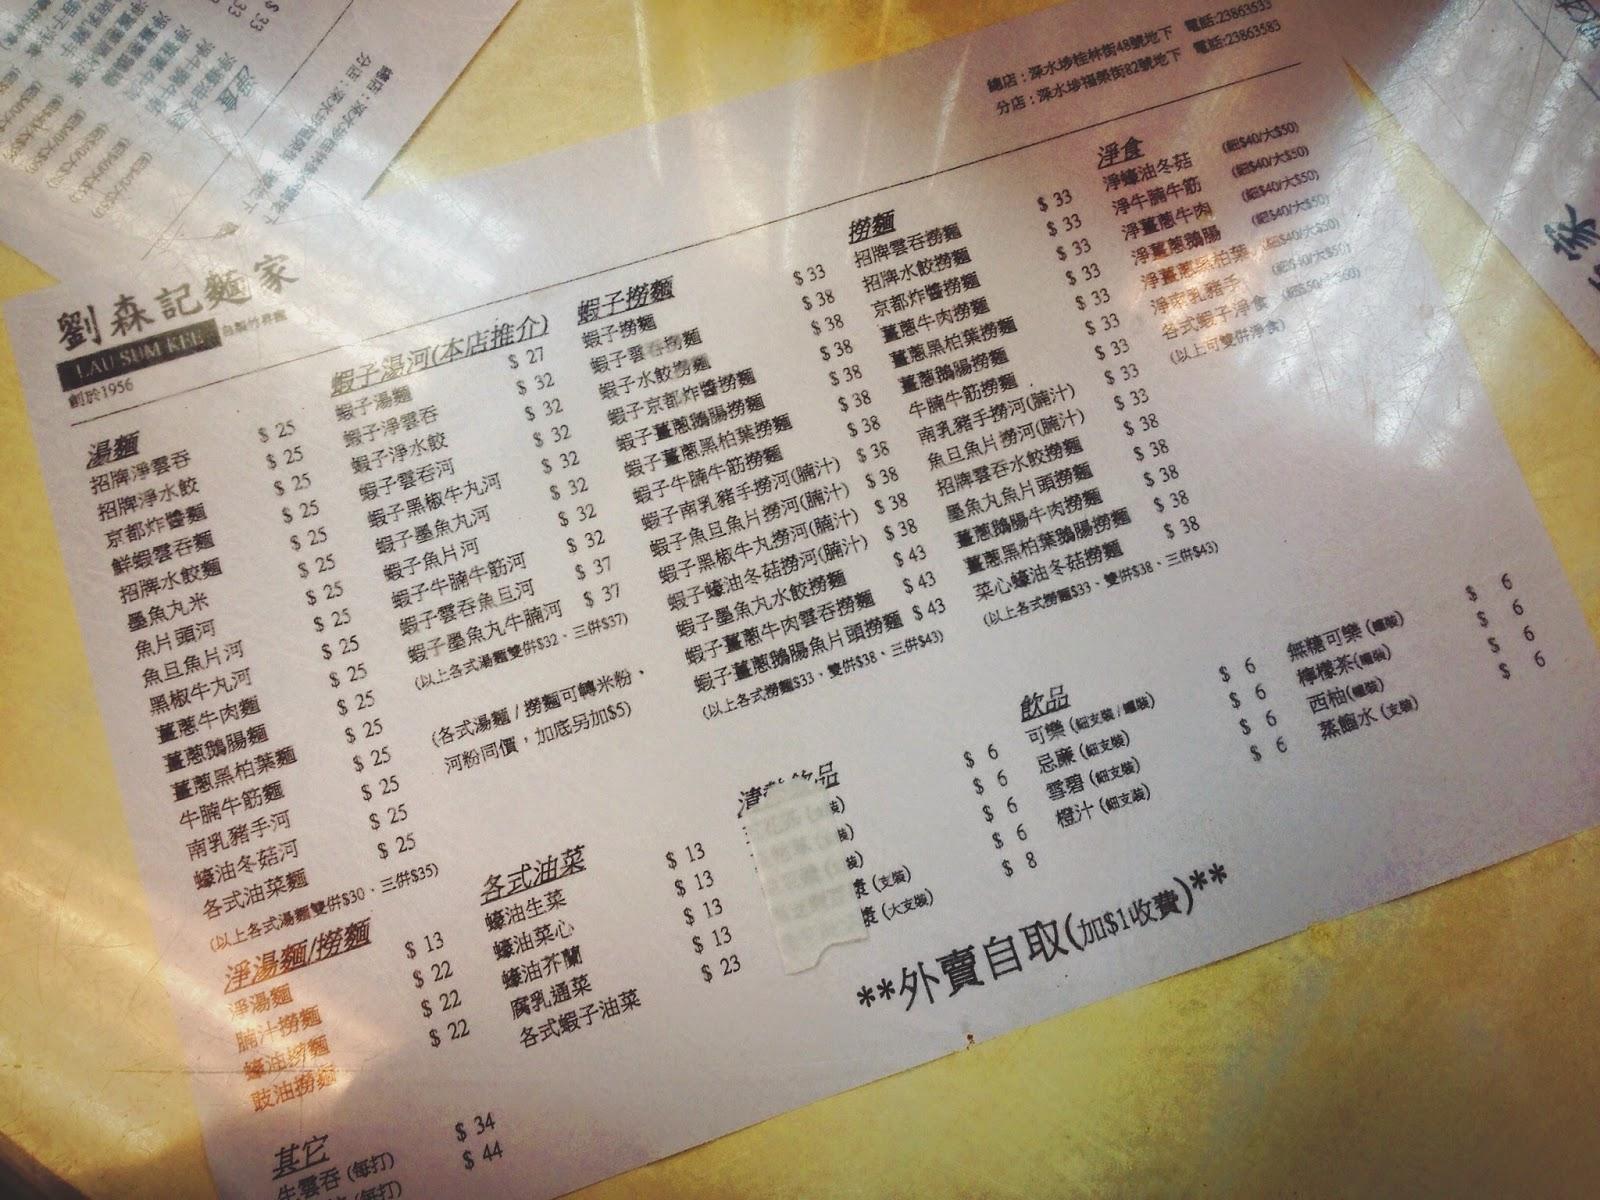 Lau Sum Kee Noodles Hong Kong Menu